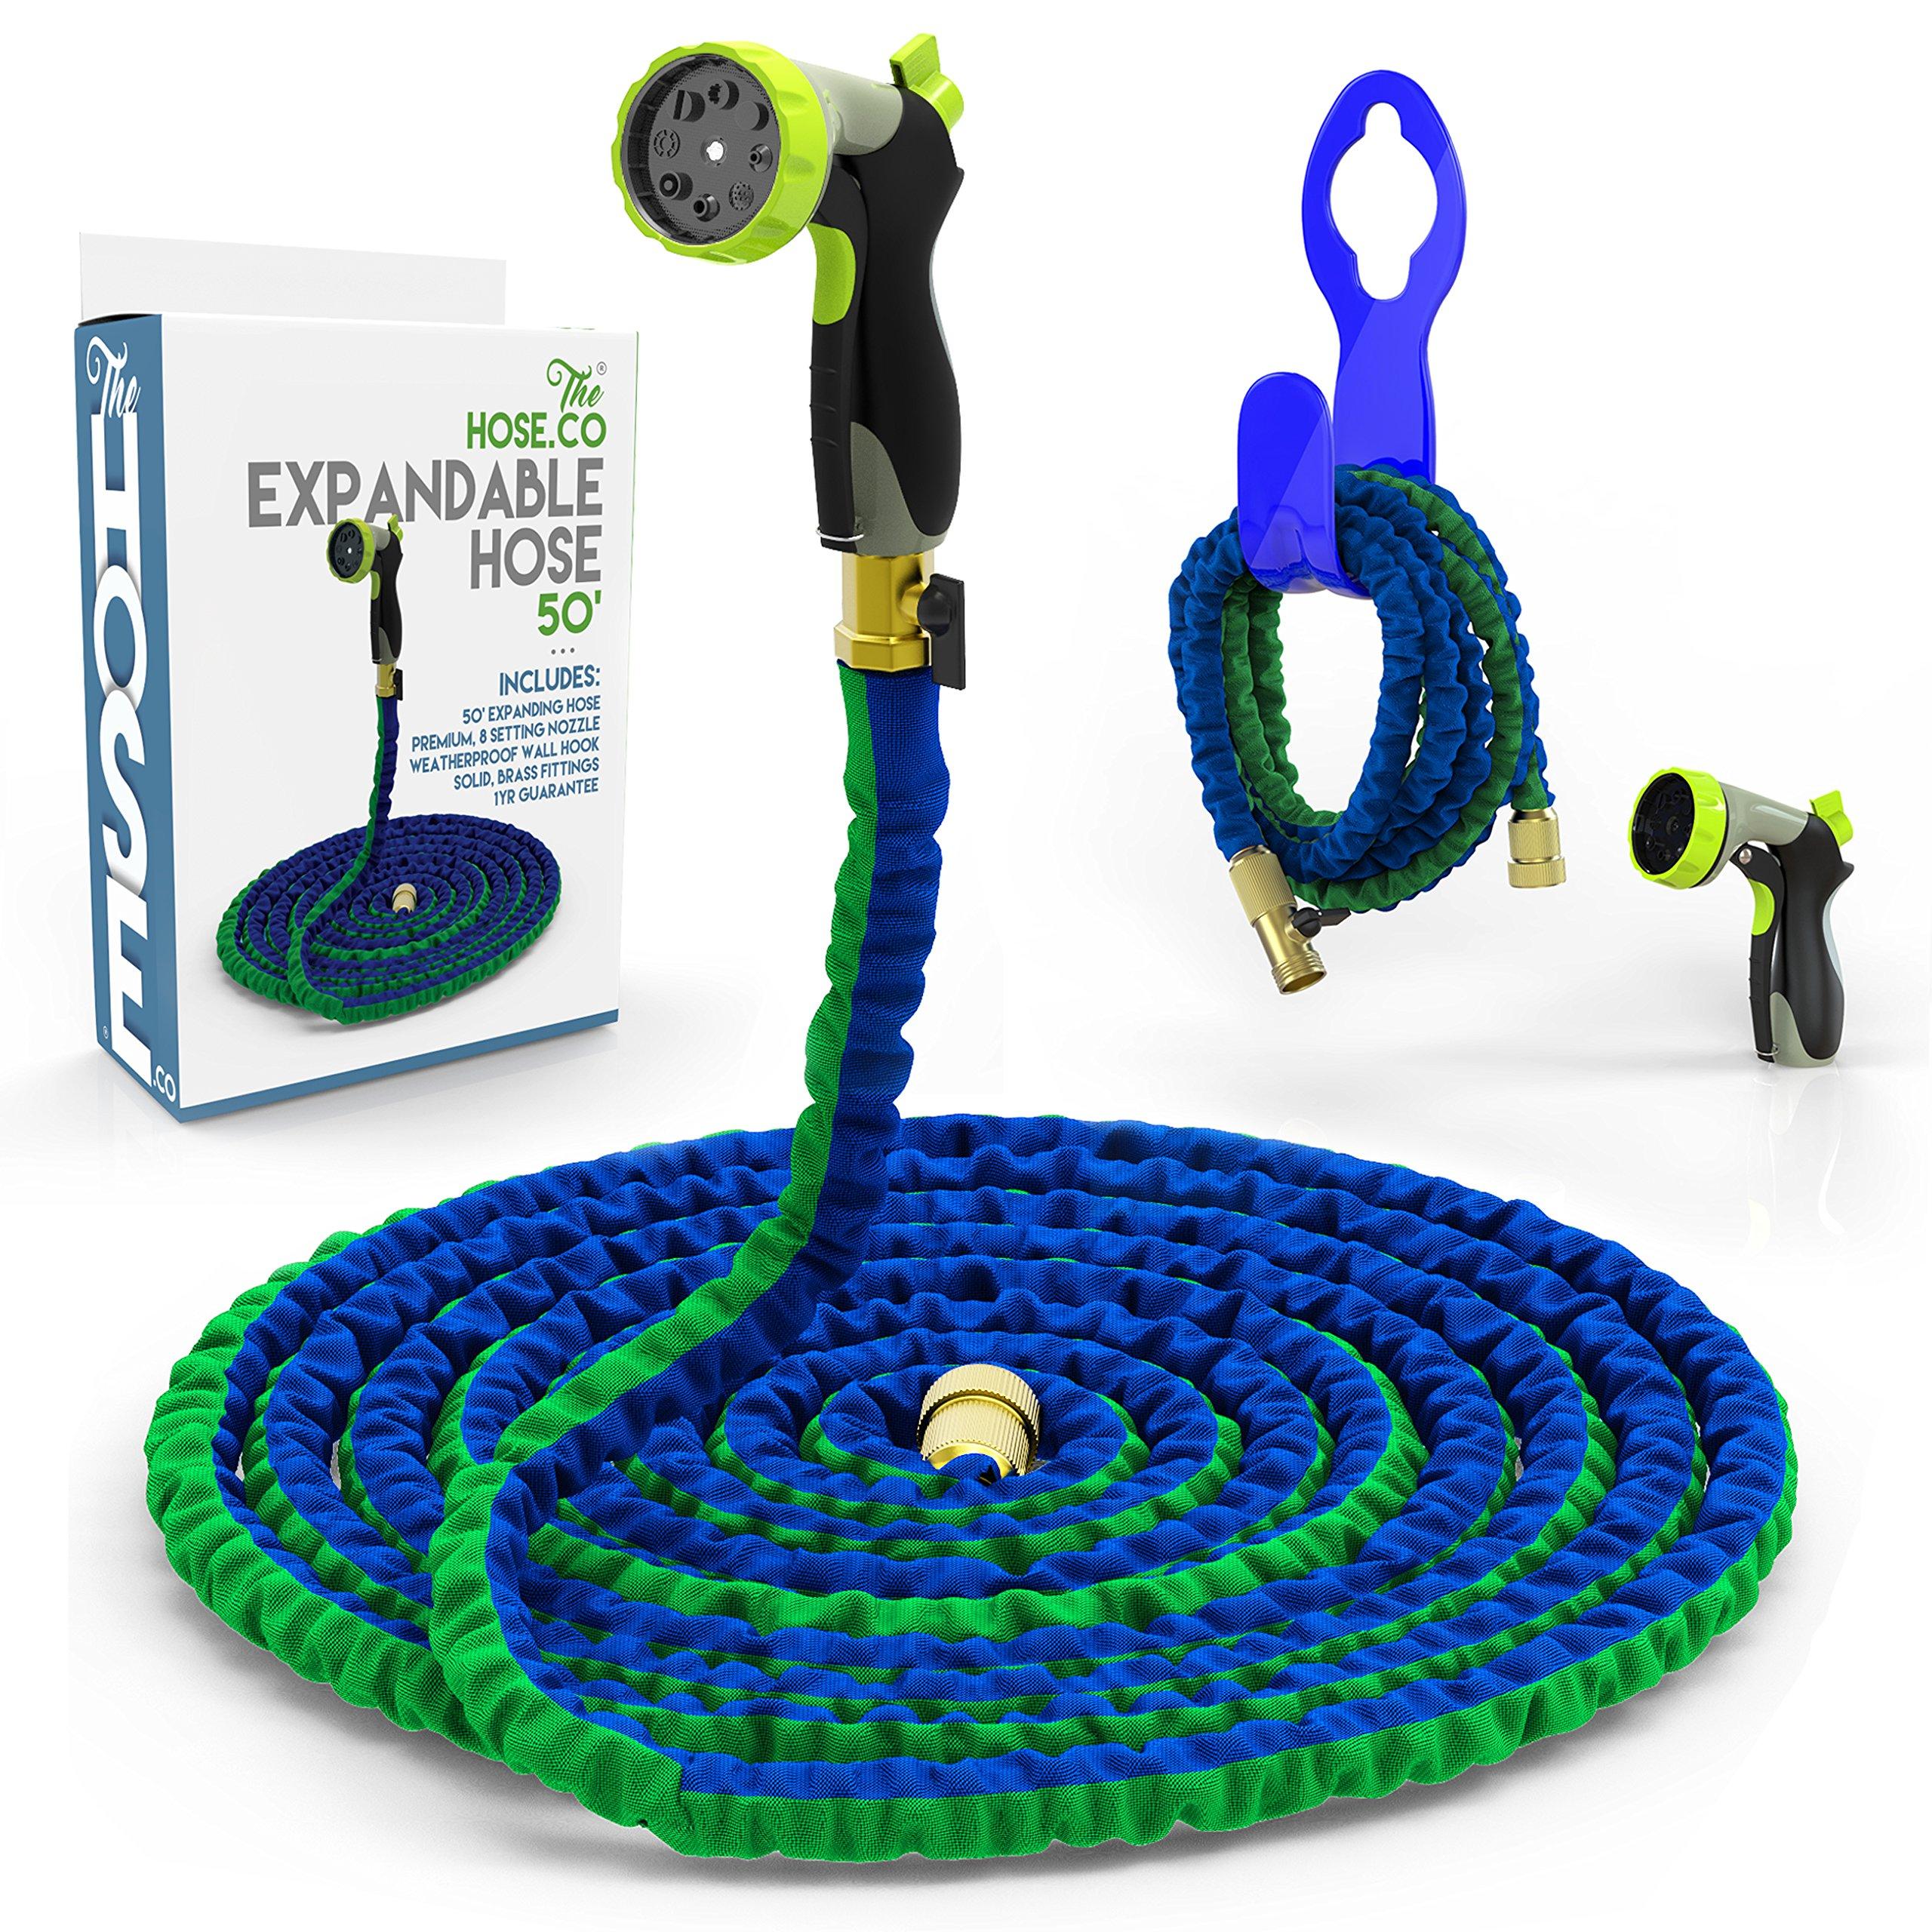 Expanding Garden Hose Kit [ The Hose Co ] Green, Blue Double Latex KinkProof Long-Lasting 50 ft Hose, Copper Fittings, 8 Function Nozzle & Bonus Wall Hook